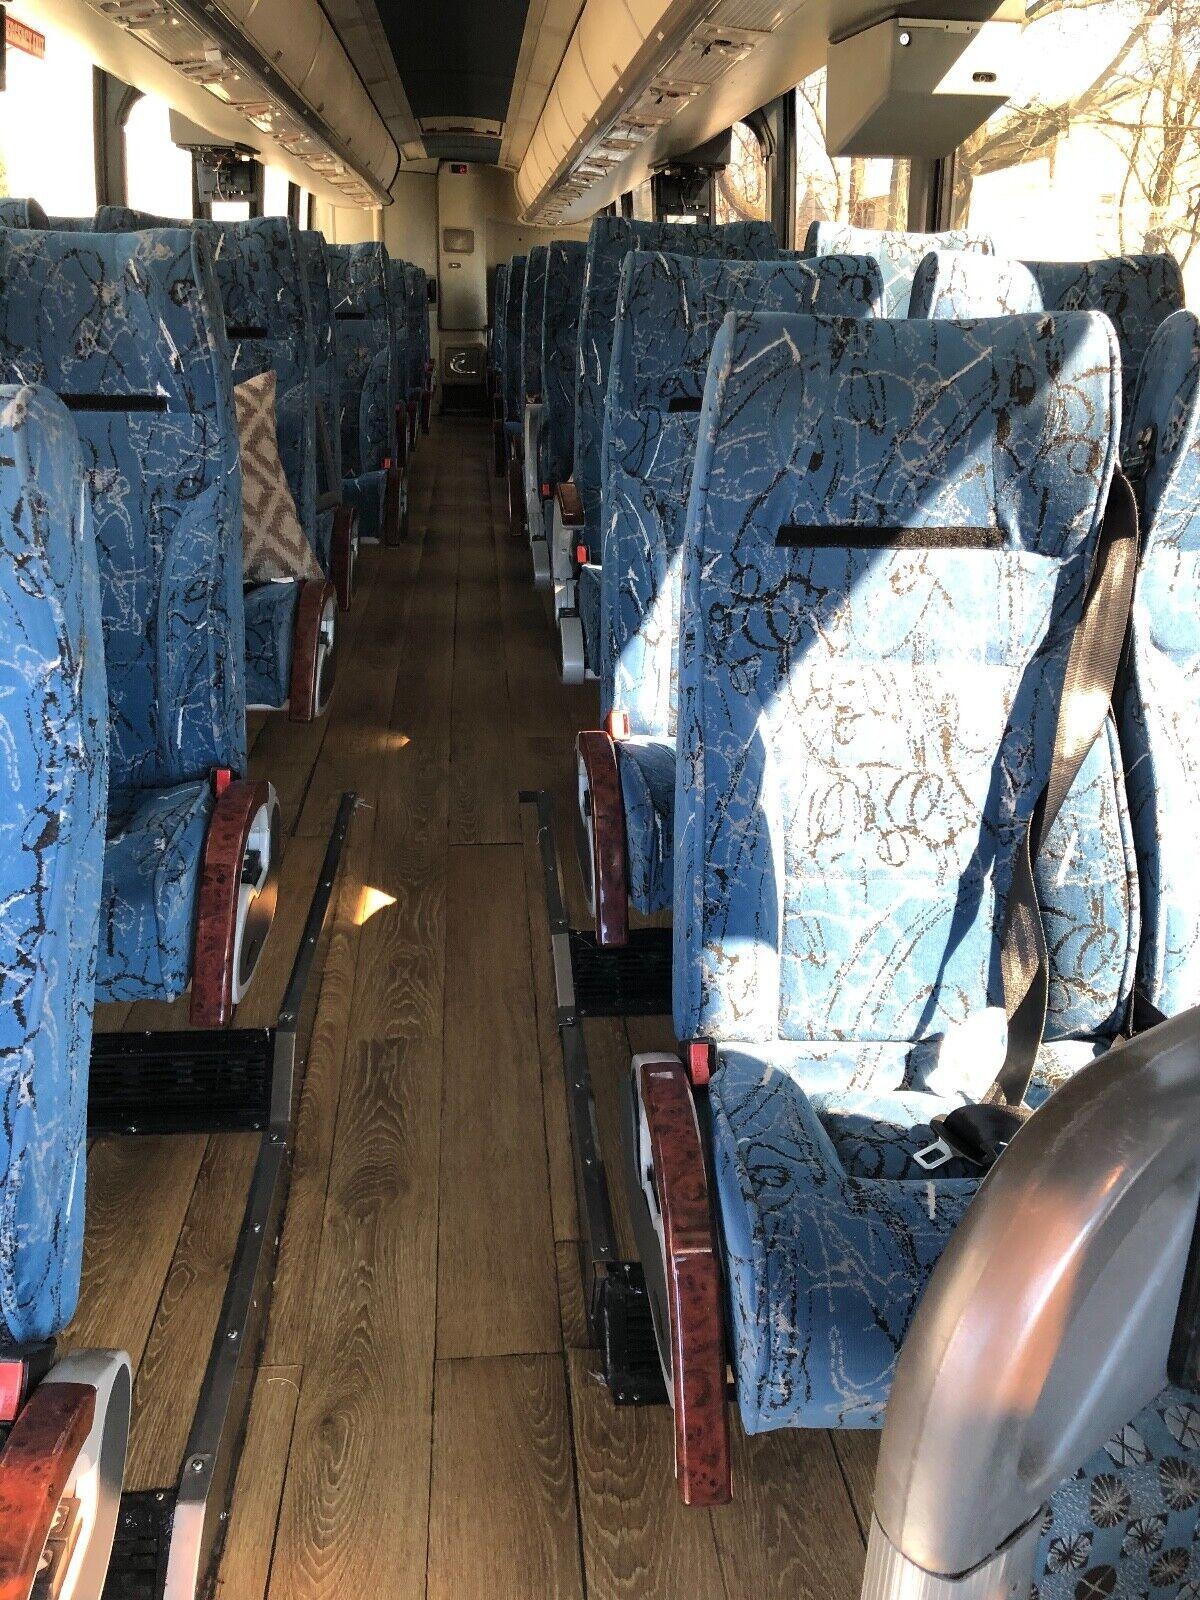 2000 MCI Model E4500 56 Passenger Motor Coach